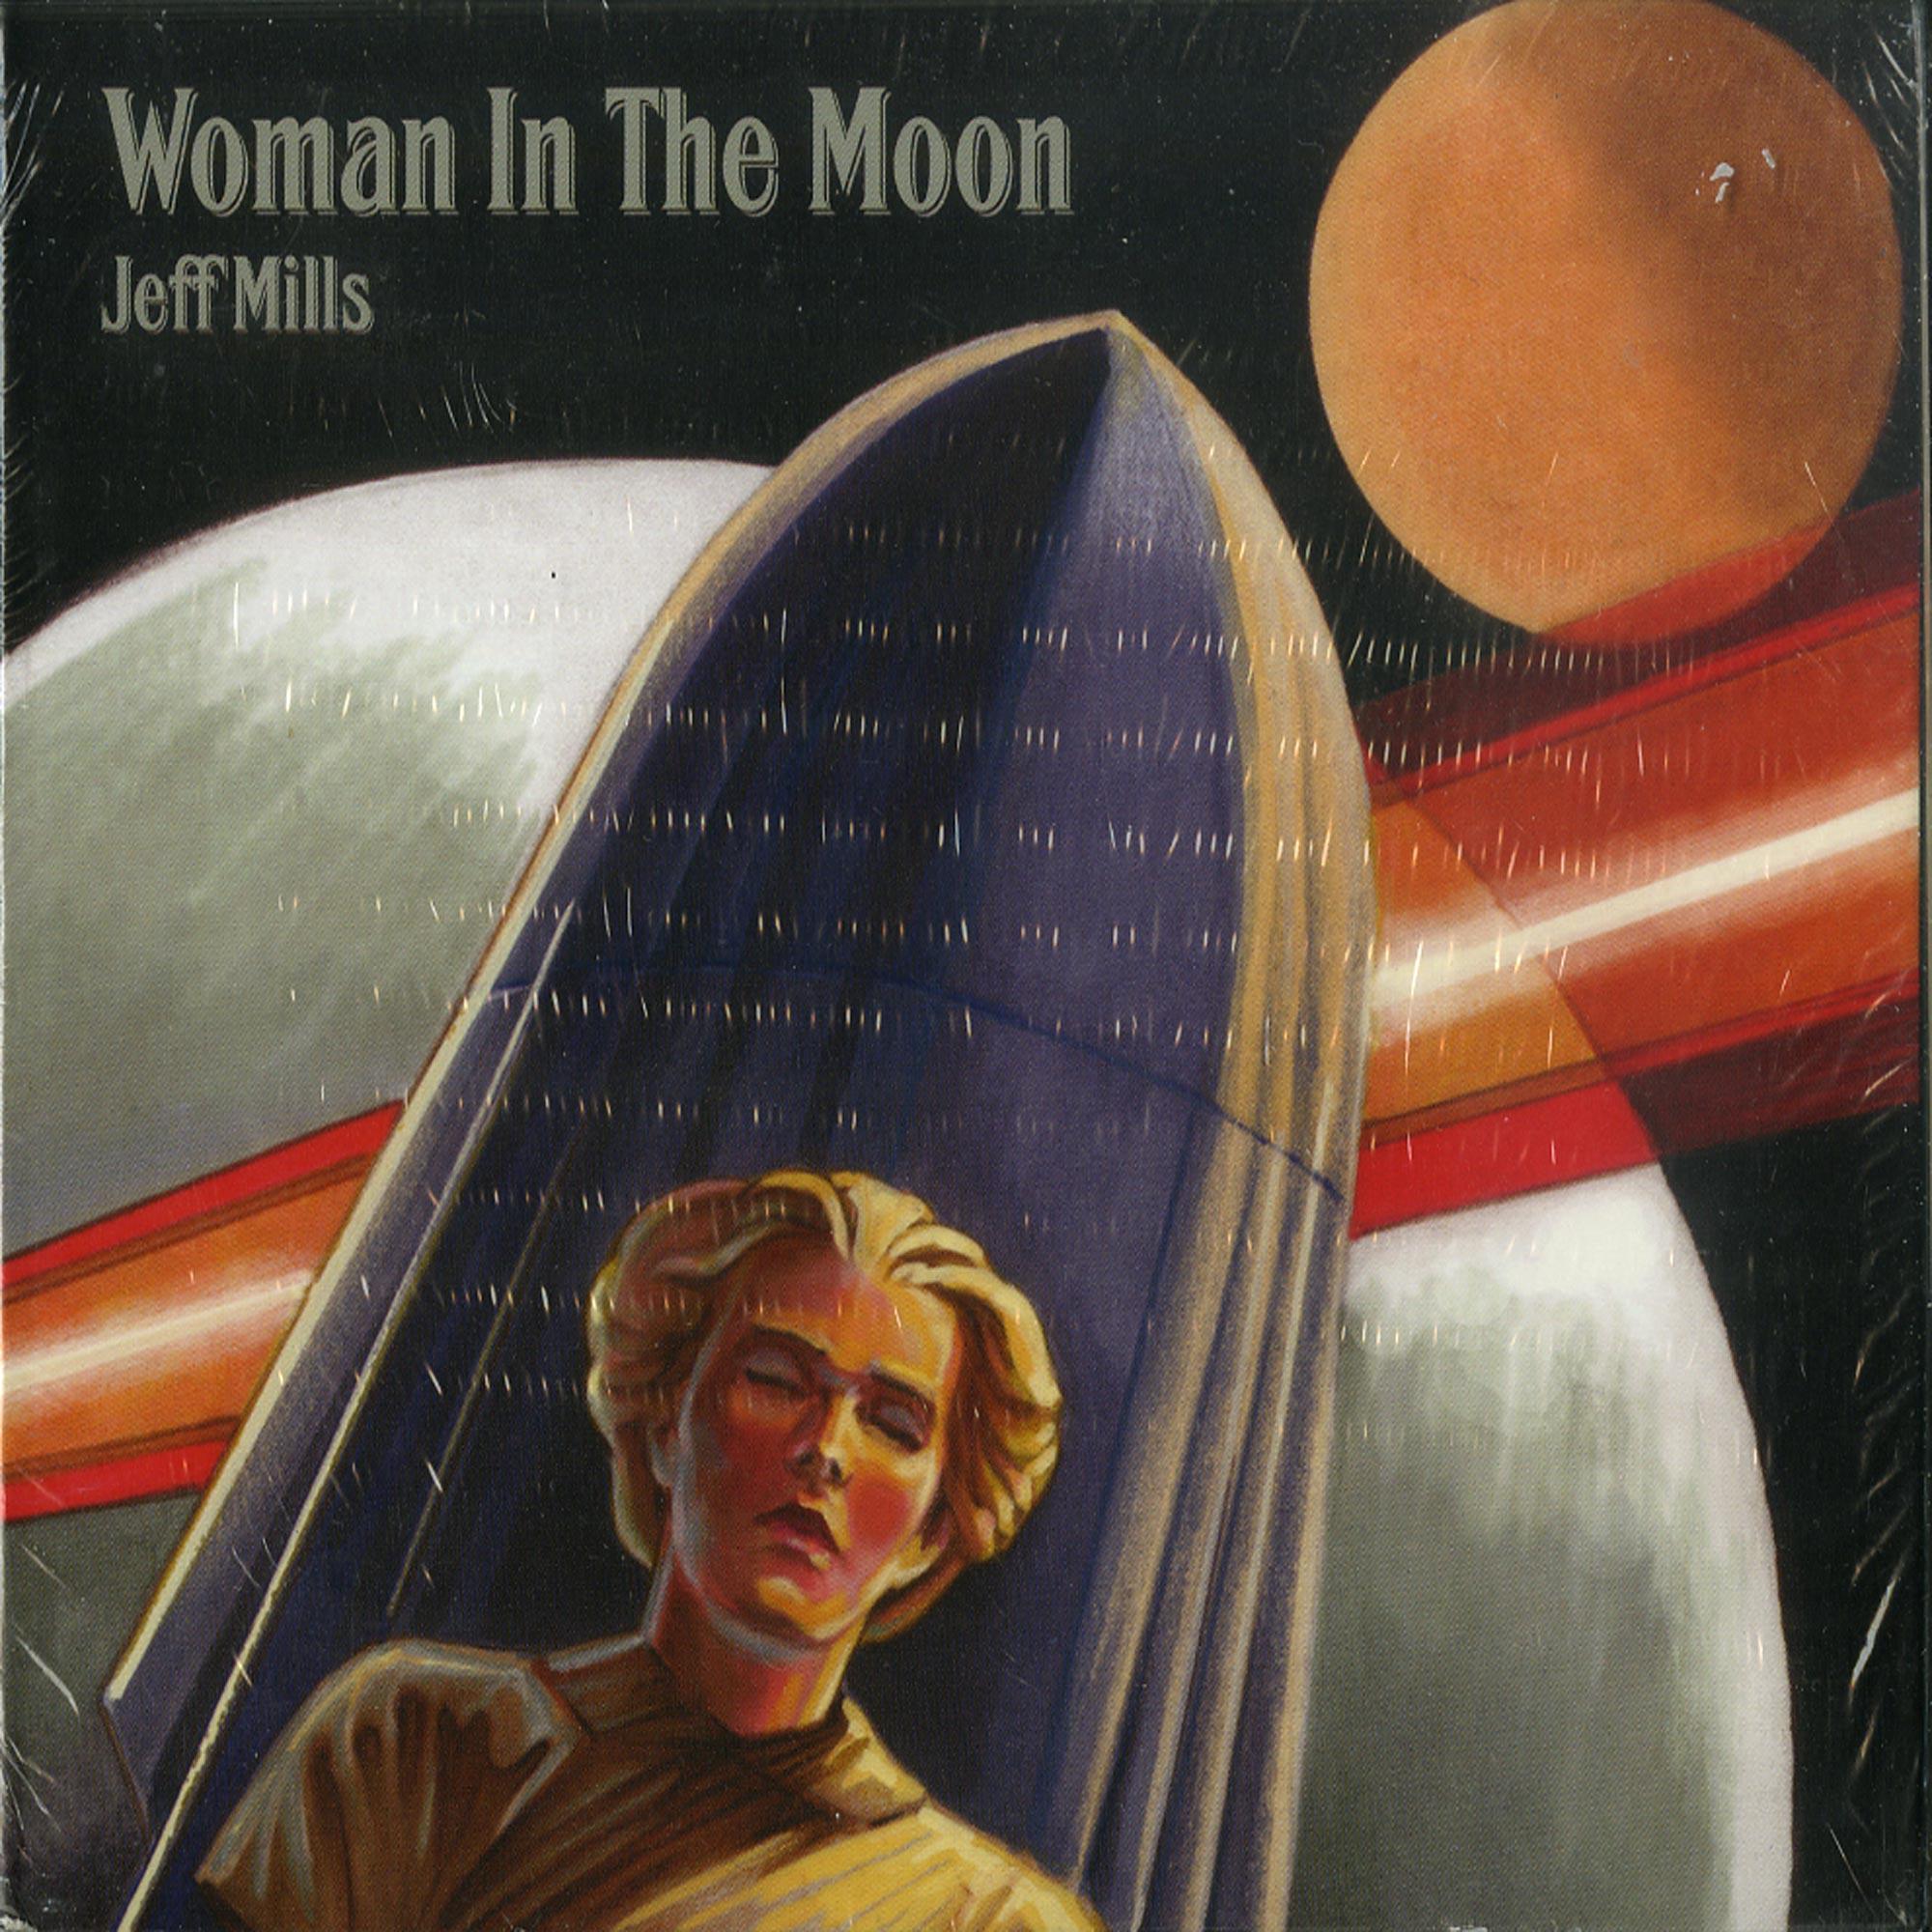 Jeff Mills - WOMAN IN THE MOON